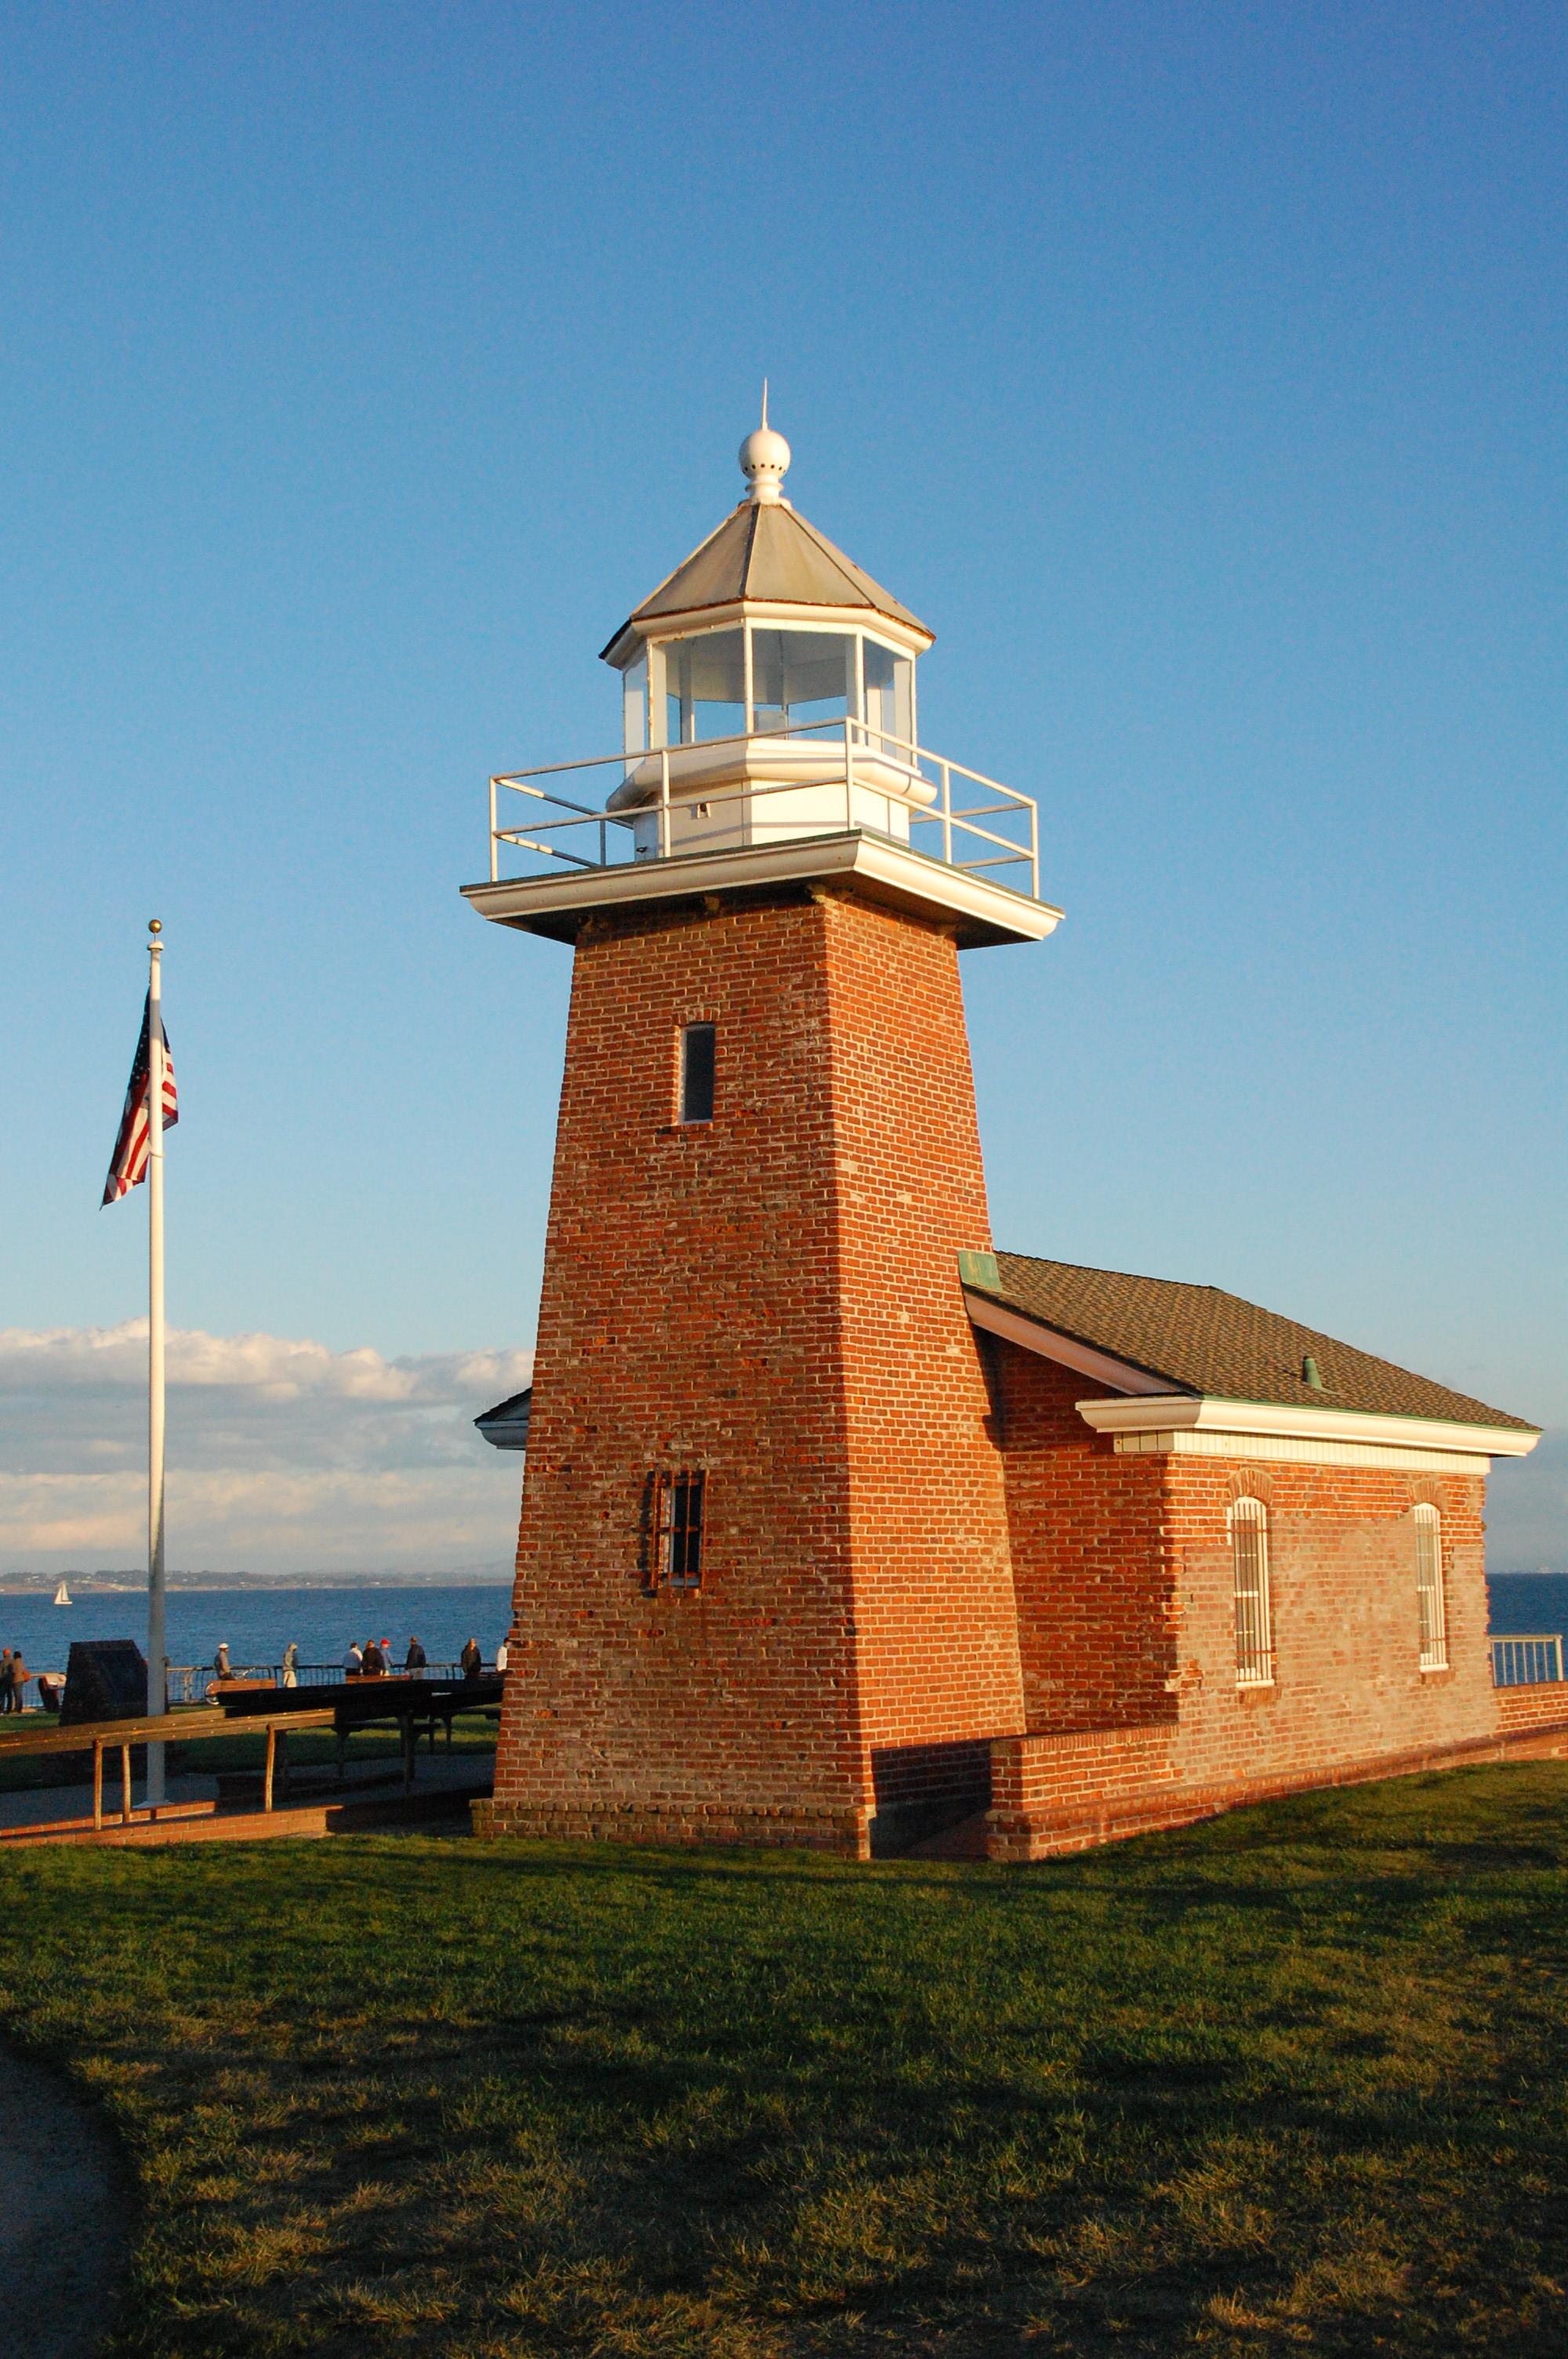 Uu >> File:Mark Abbott Memorial Lighthouse, Santa Cruz, California USA.JPG - Wikimedia Commons